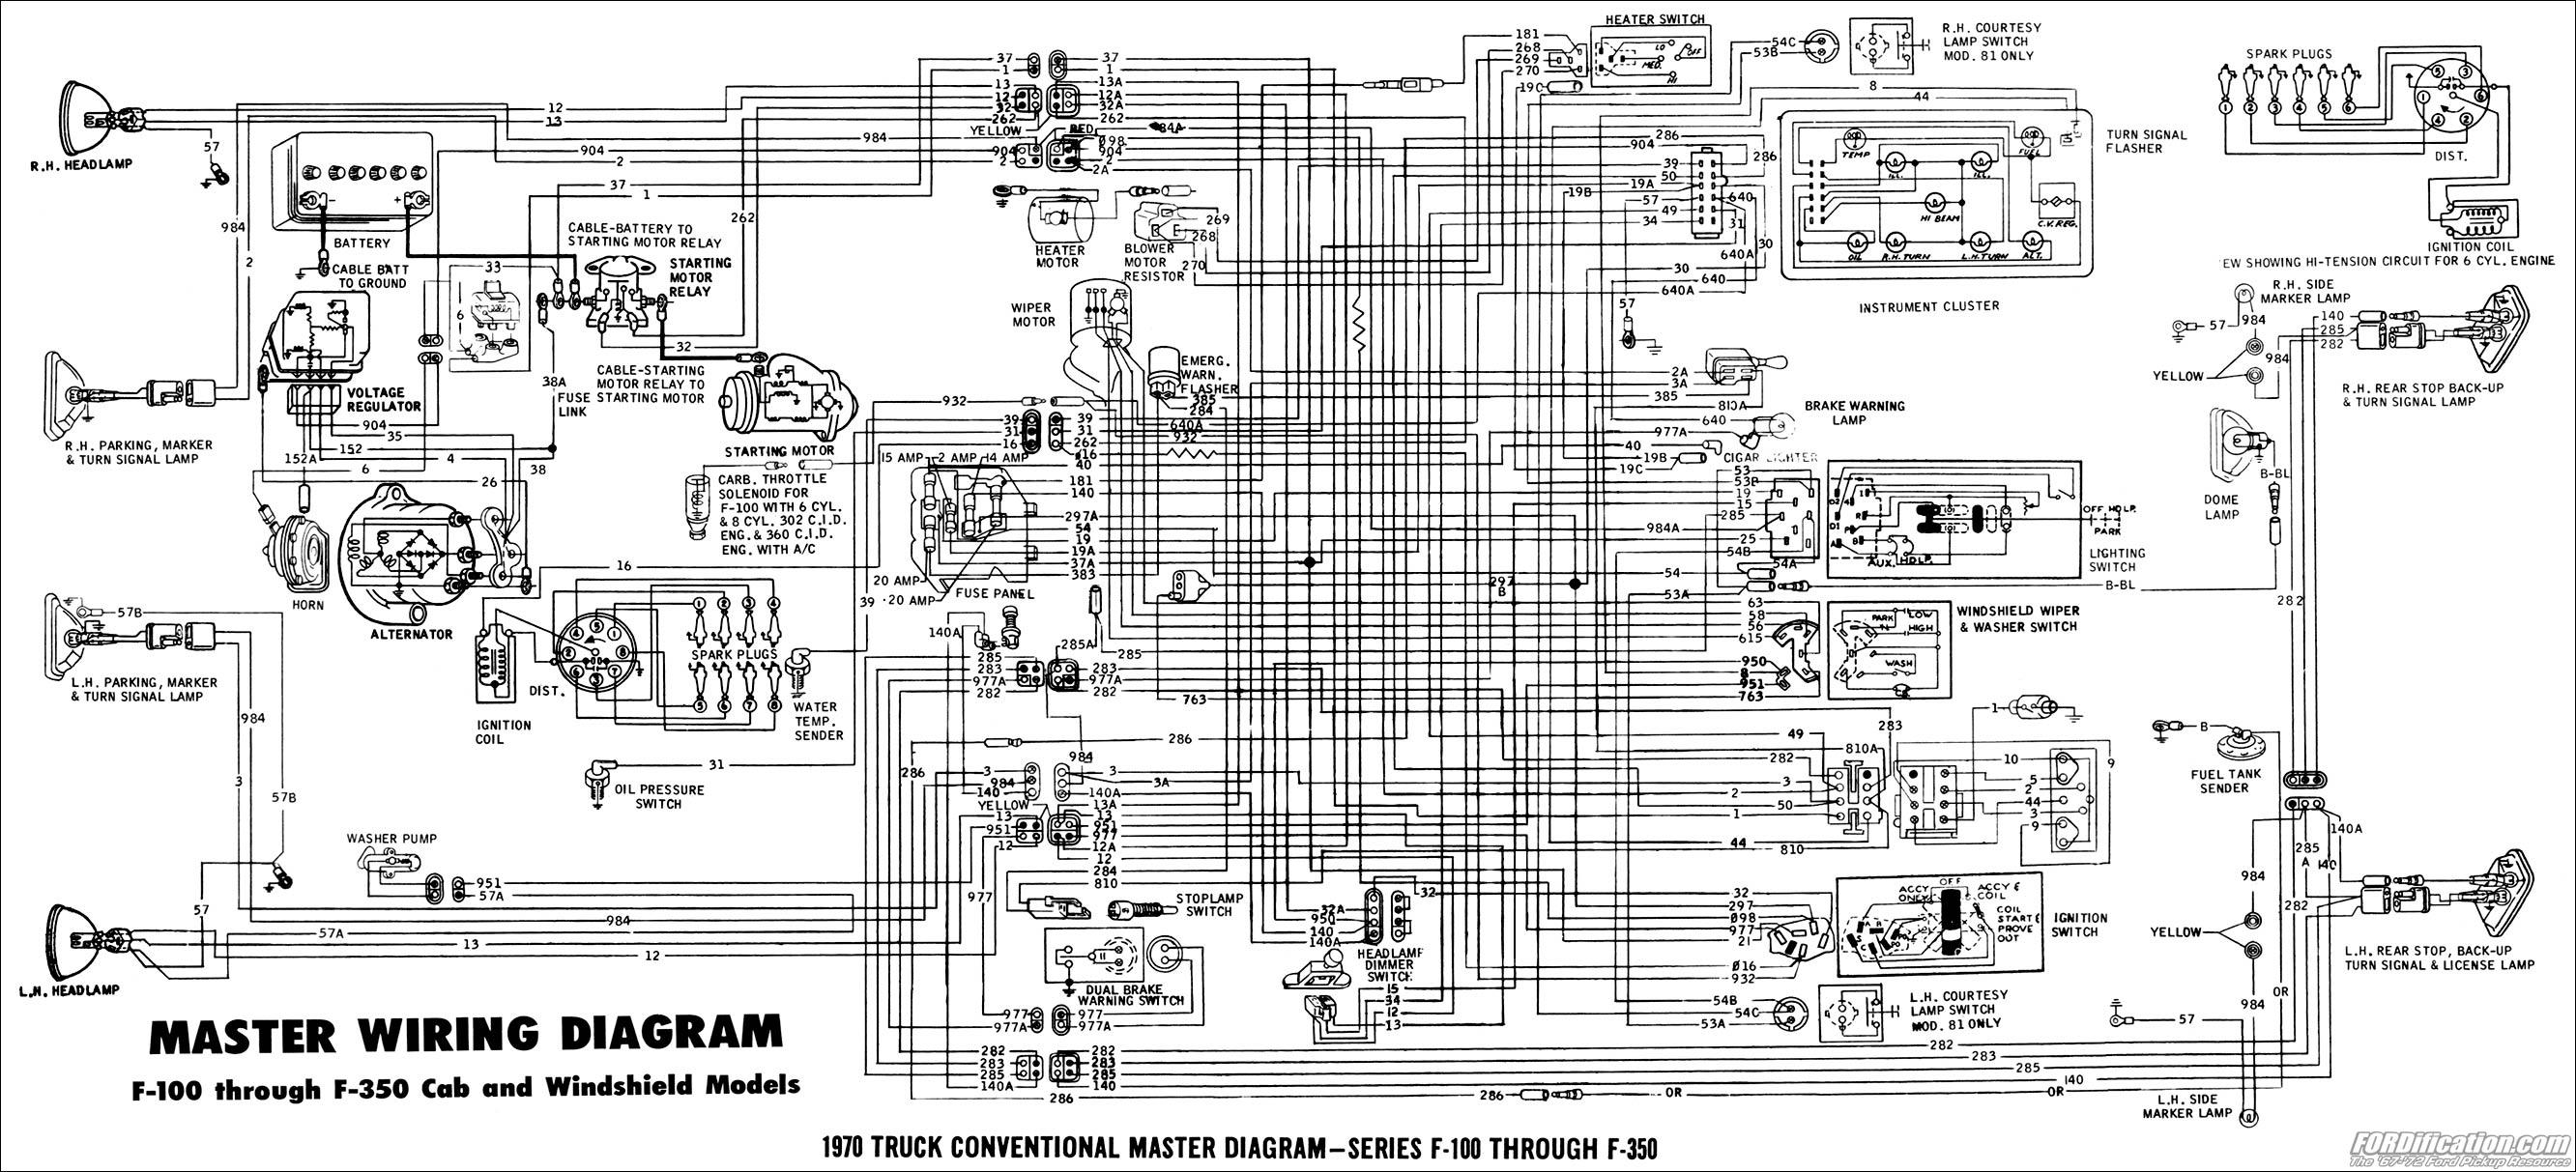 Valet Remote Start Wiring Diagram - Wiring Library •